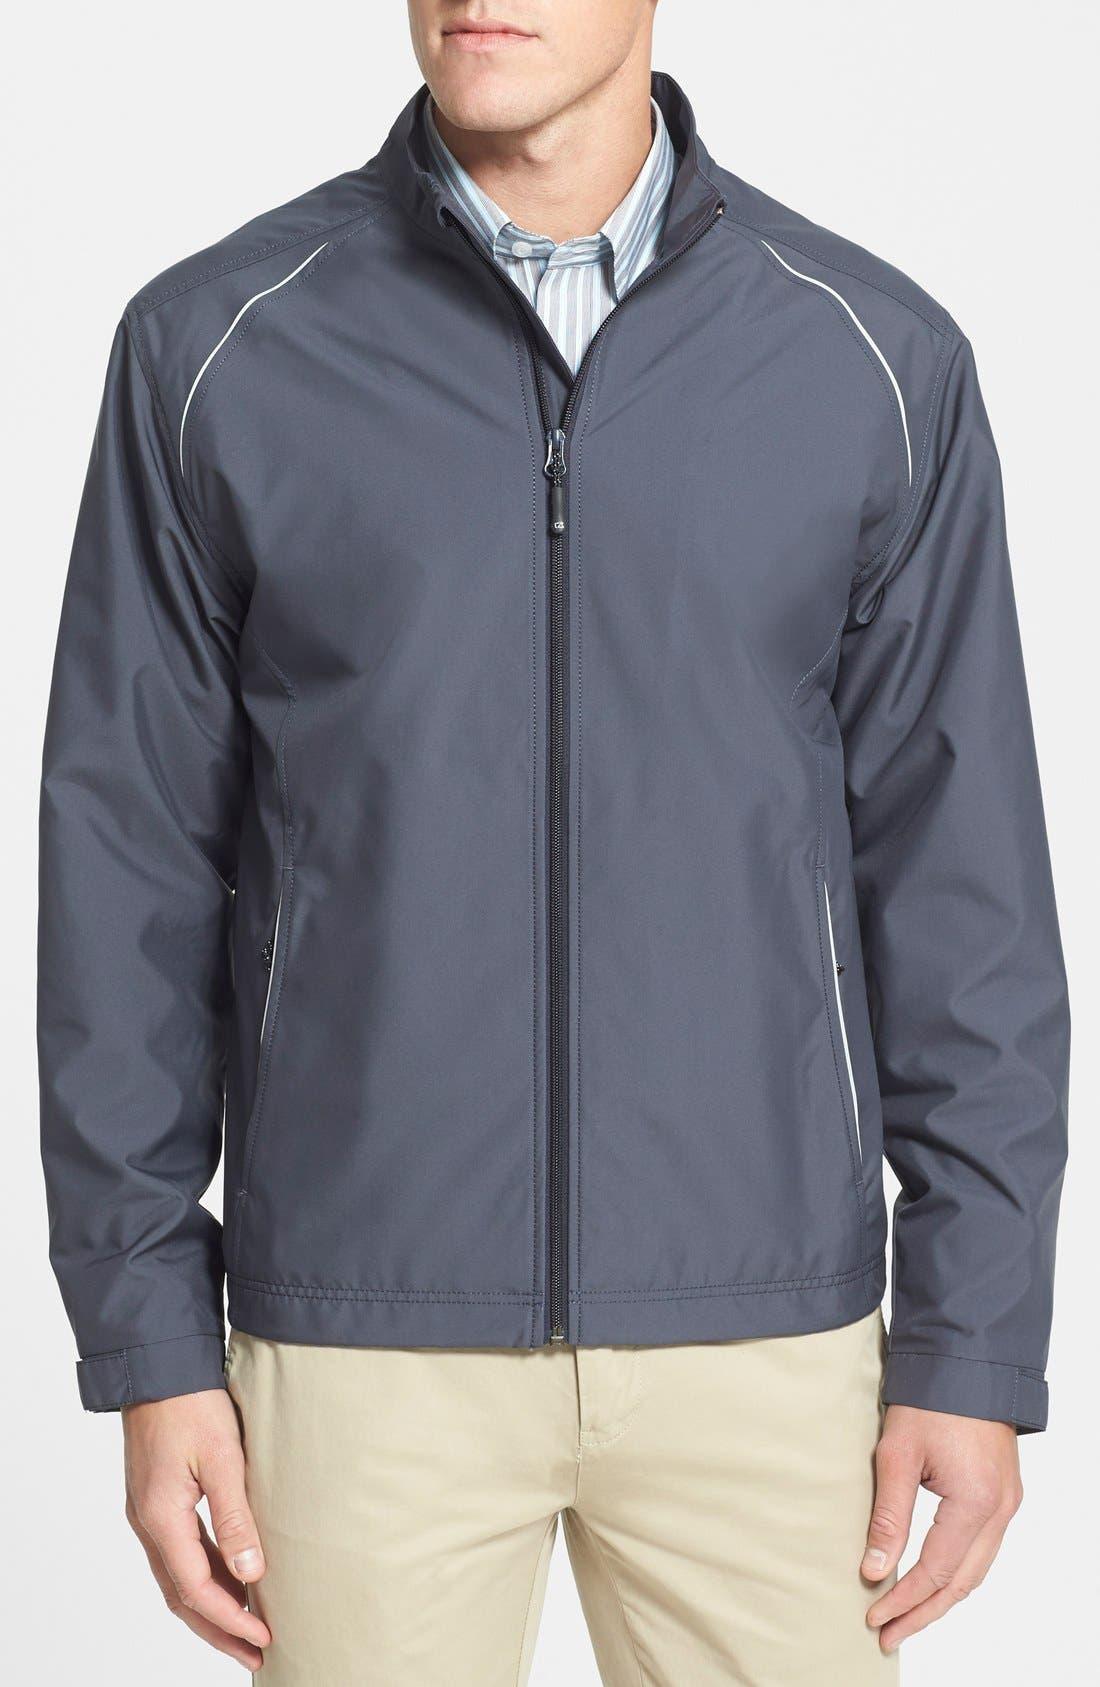 Main Image - Cutter & Buck Beacon WeatherTec Wind & Water Resistant Jacket